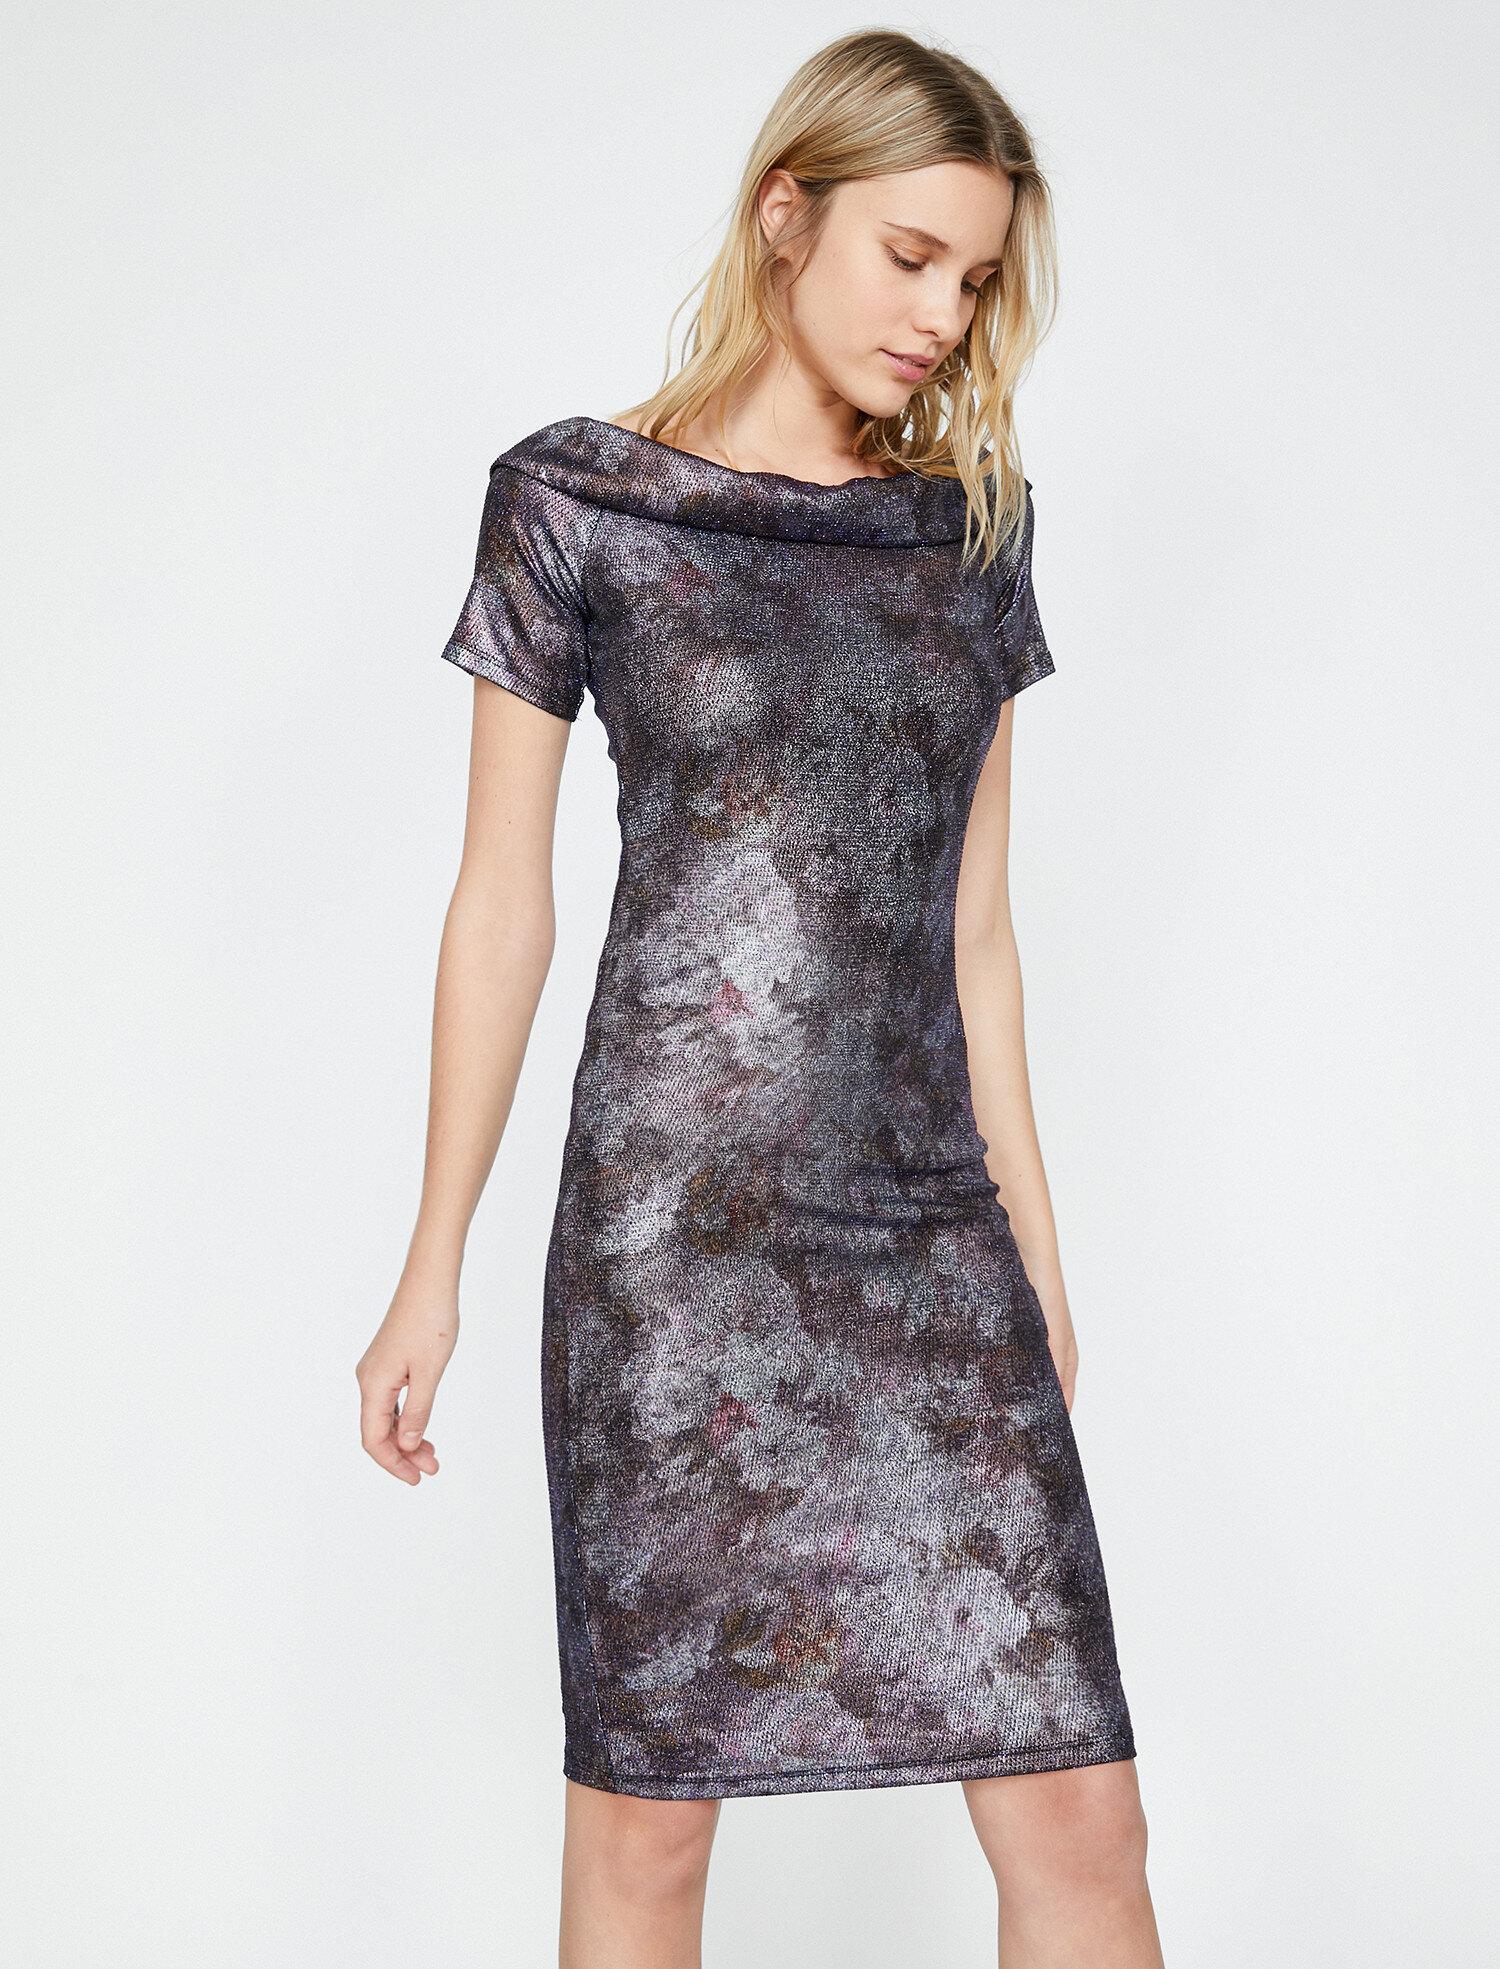 87c2a8356b2d4 Brand-Store | 100 TL ve altı beyaz elbise